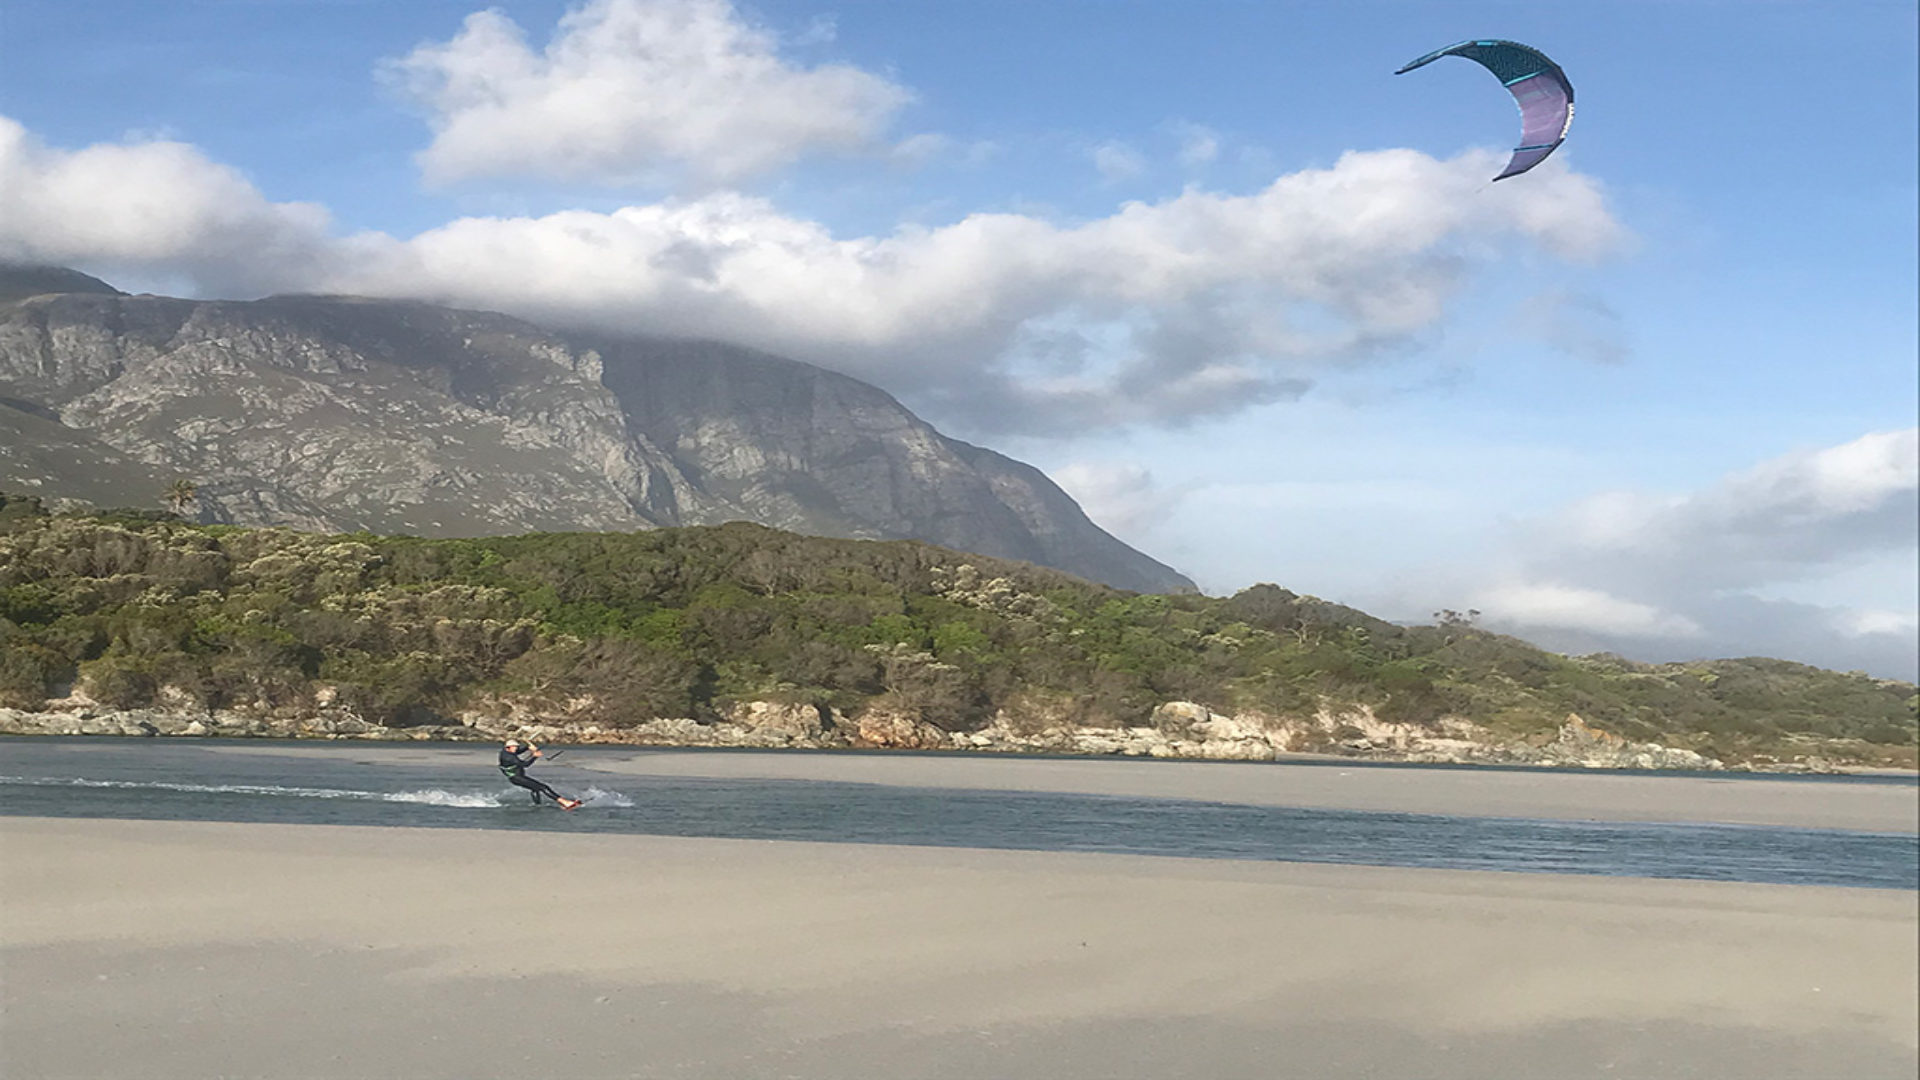 kite-surf-hermanus-sand-mountain-1024x768